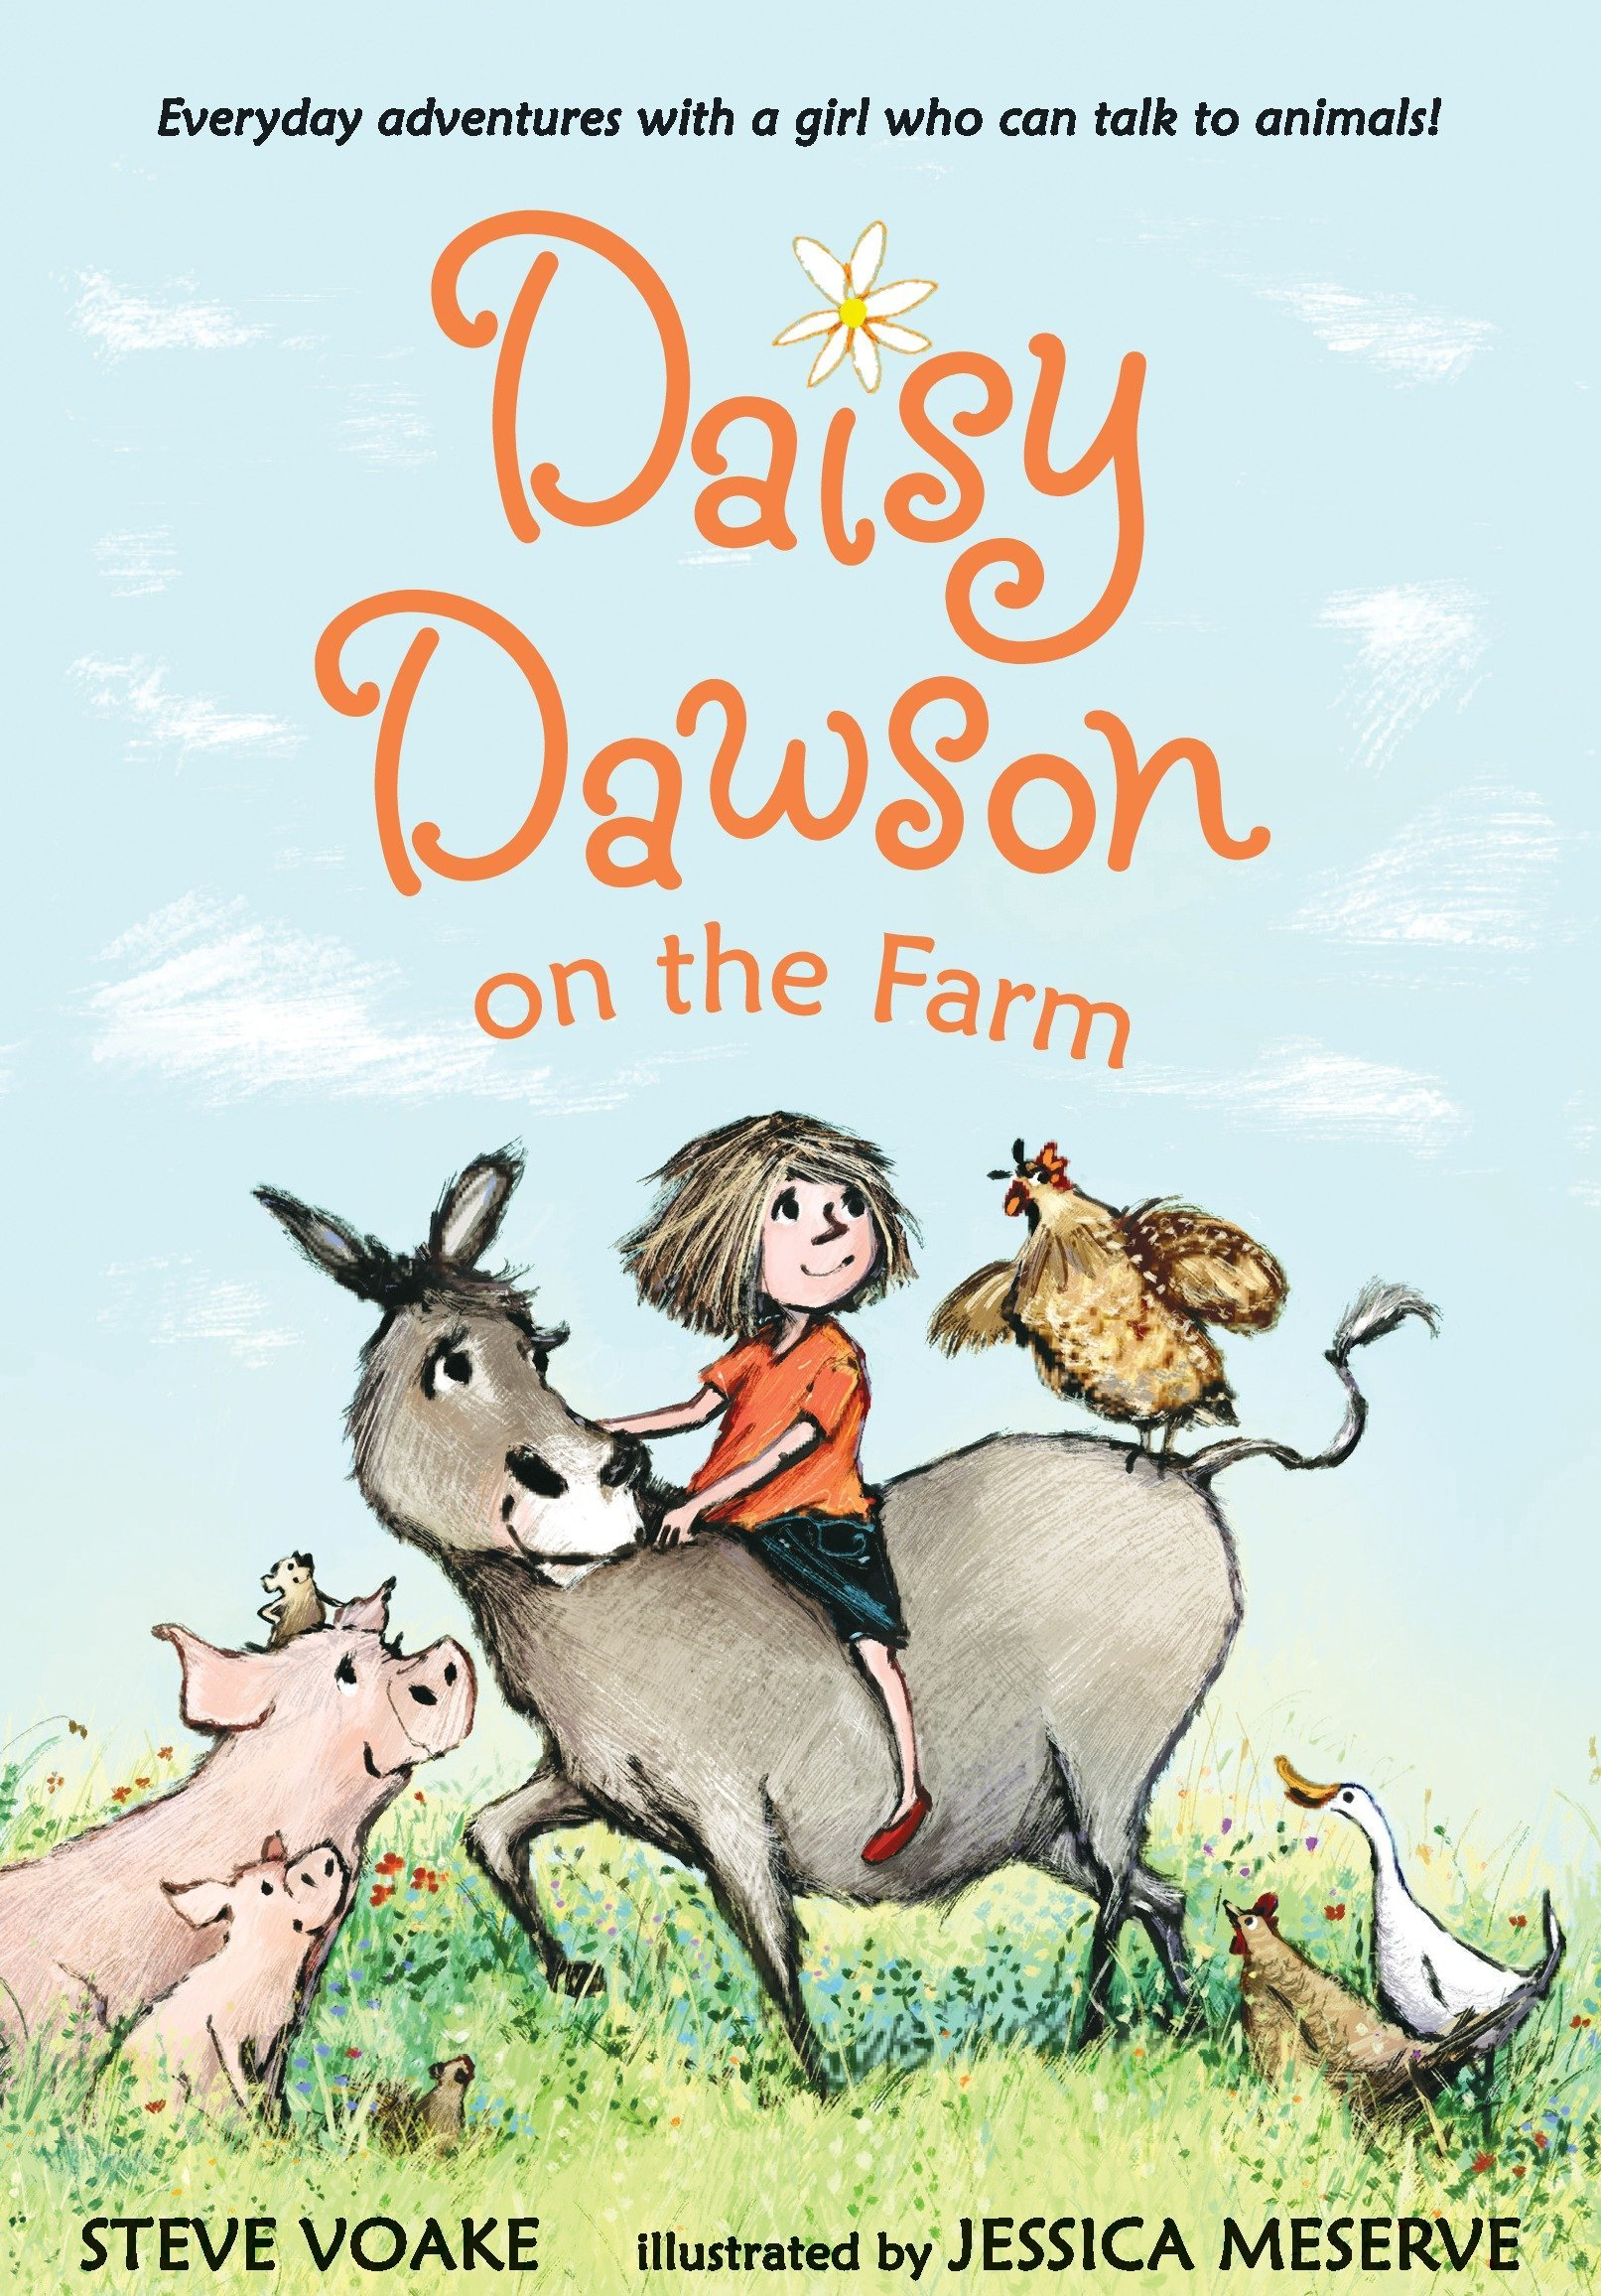 Amazon.com: Daisy Dawson on the Farm (9780763663407): Steve Voake, Jessica  Meserve: Books